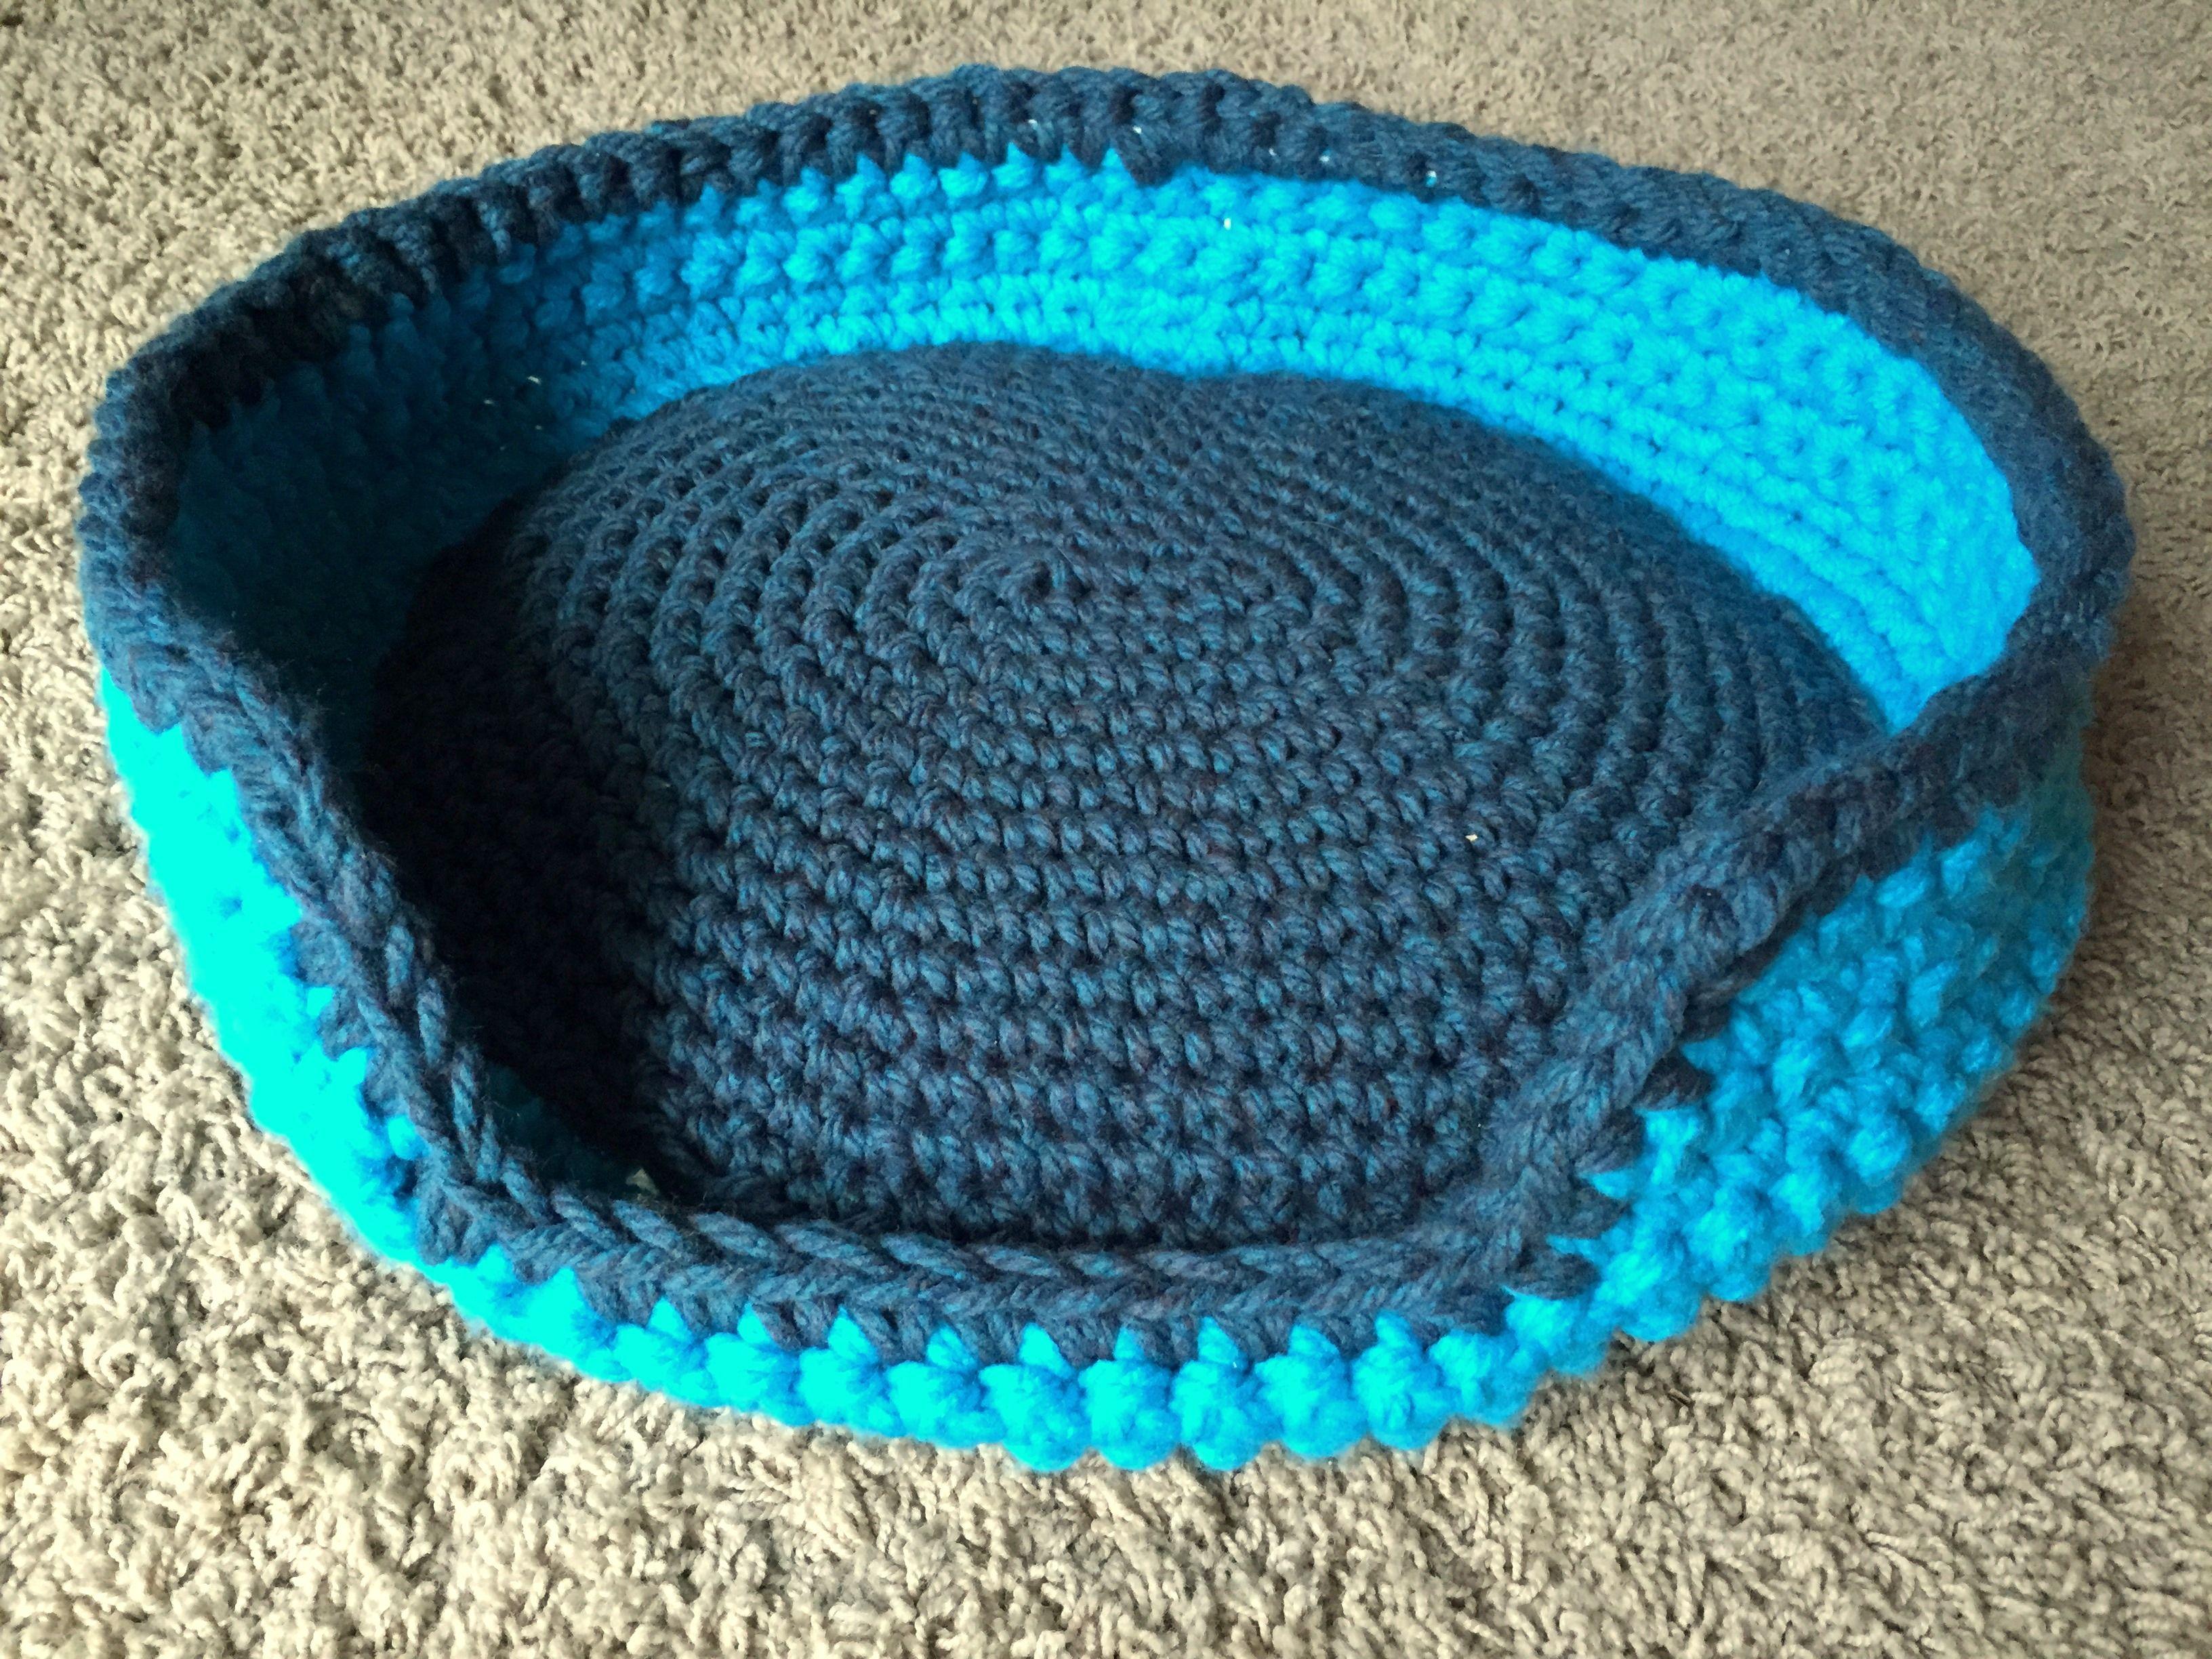 New Pattern – Sturdy & Comfy Cat Bed | Katzenbett, Hundebett und ...